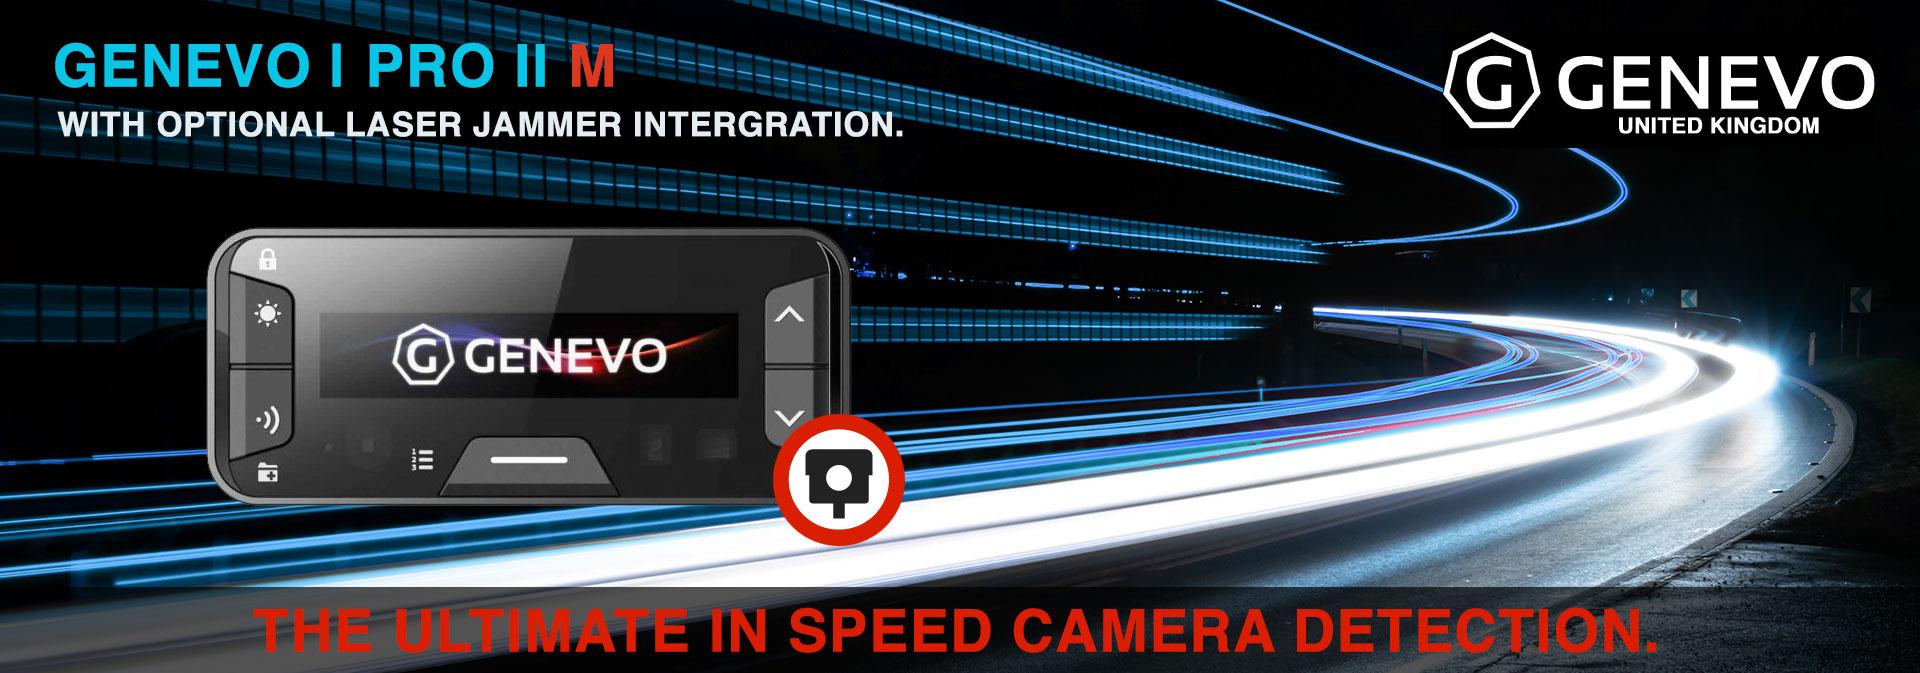 Genevo Pro 2 M - Installed Speed Camera Alert System